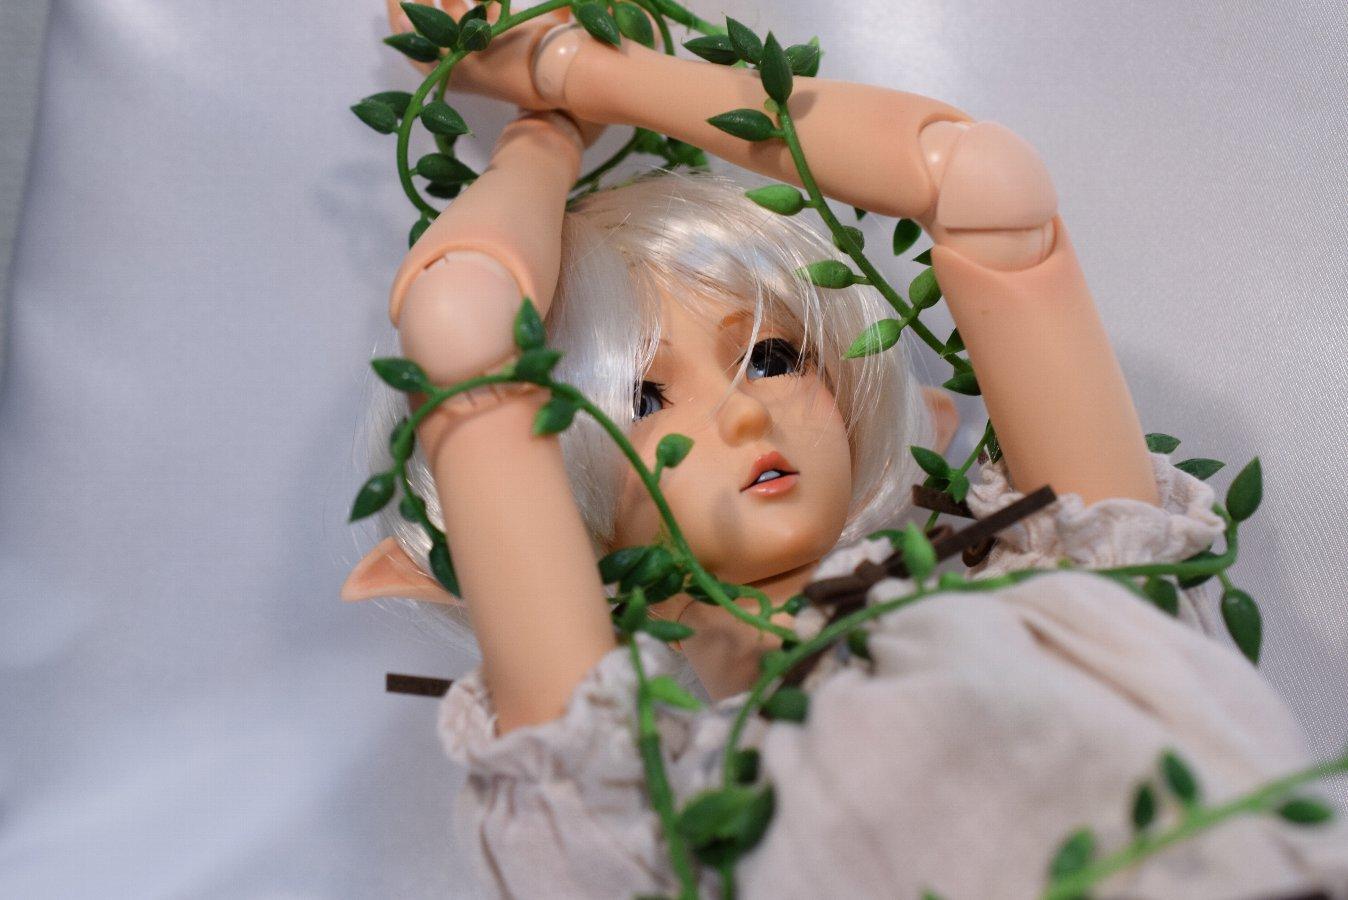 doll_682.jpg